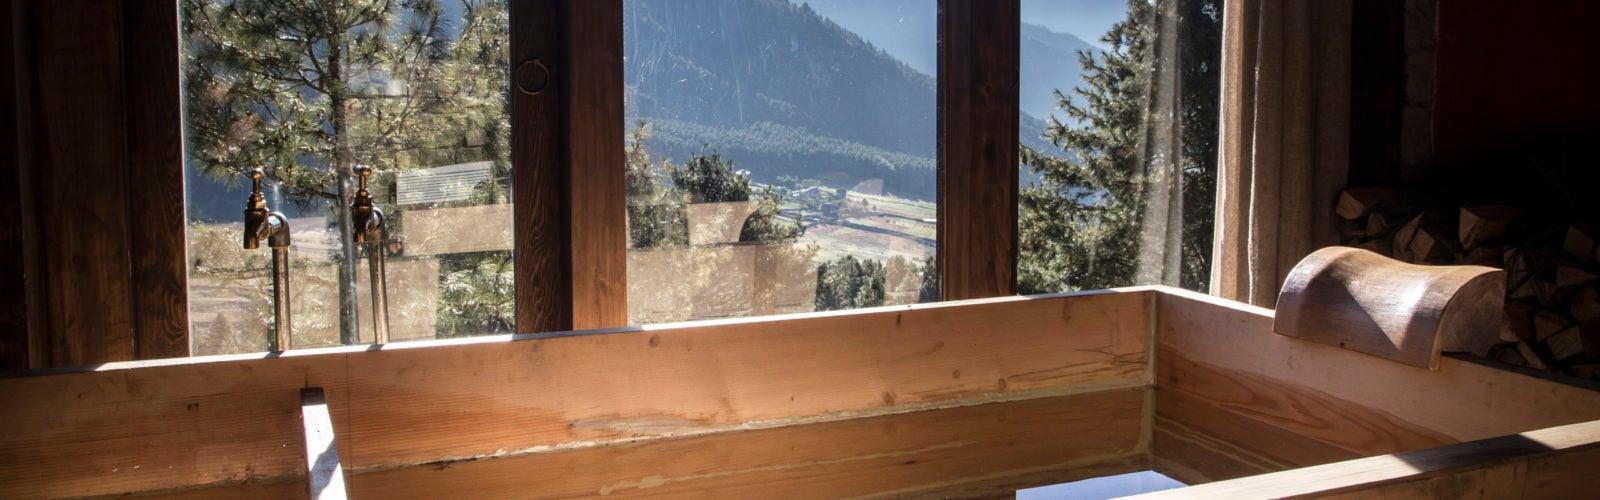 gangtey-lodge-spa-view